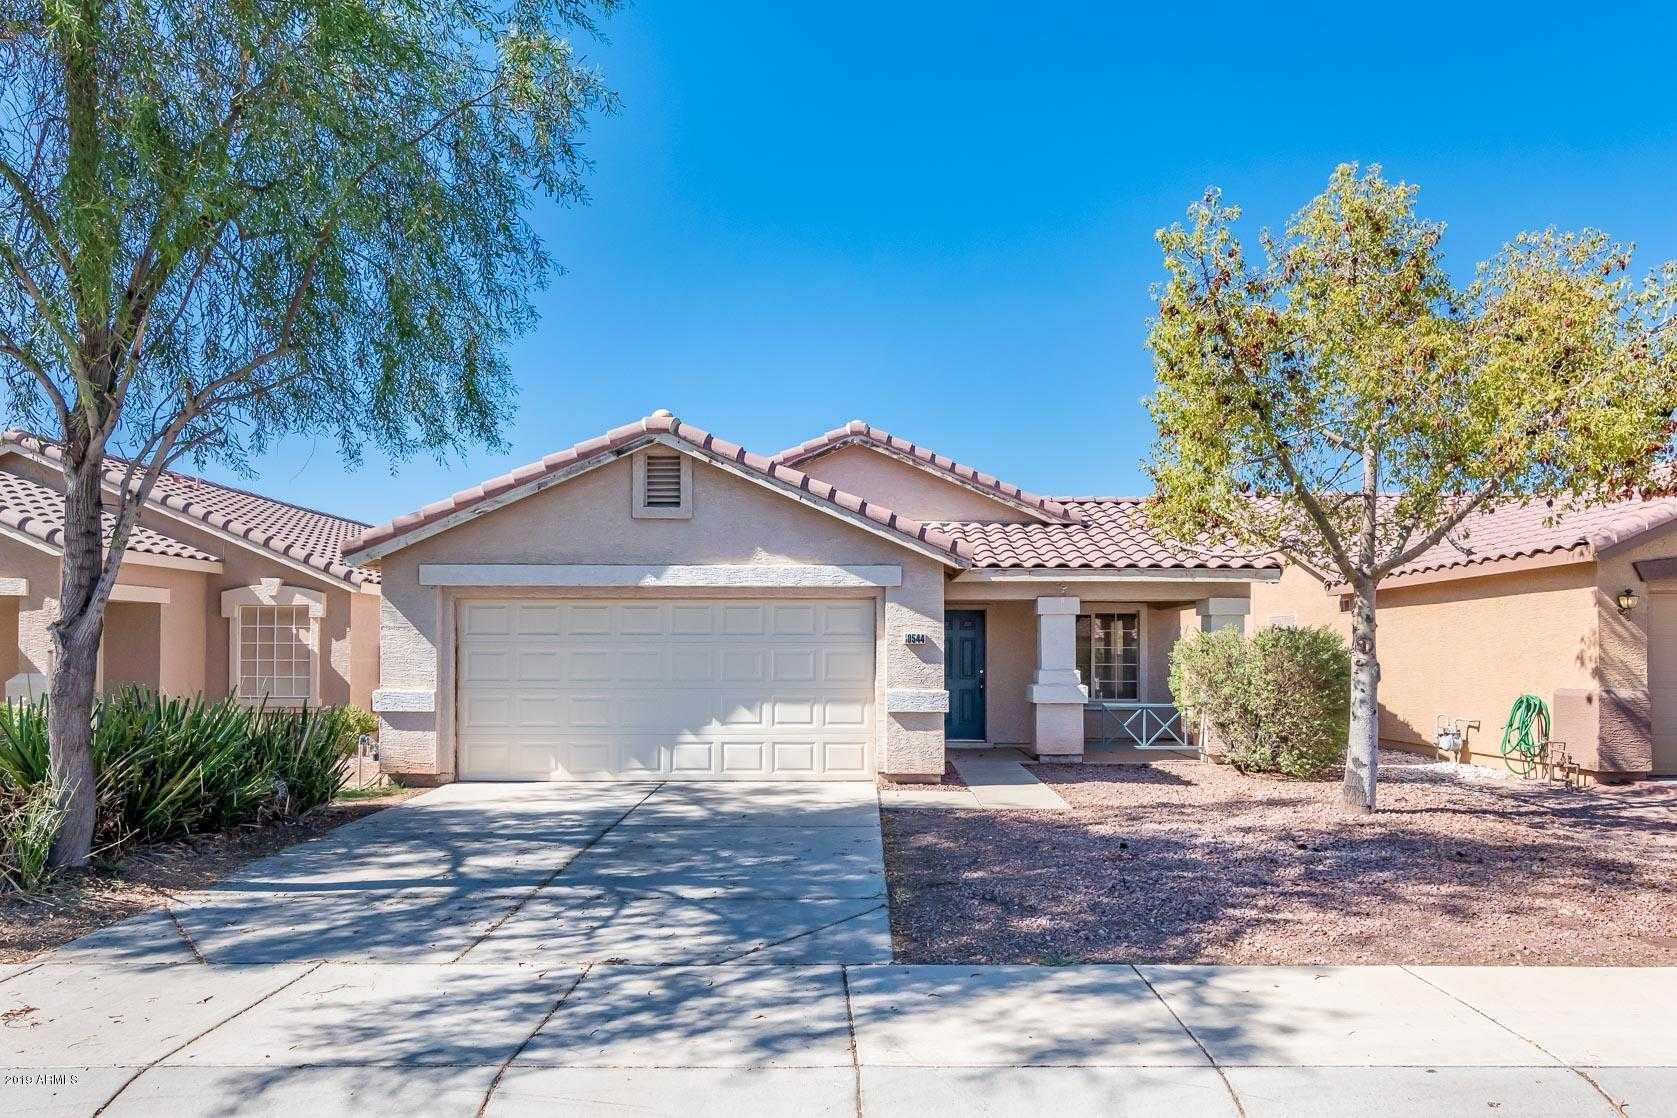 $209,000 - 3Br/2Ba - Home for Sale in Larissa, Glendale